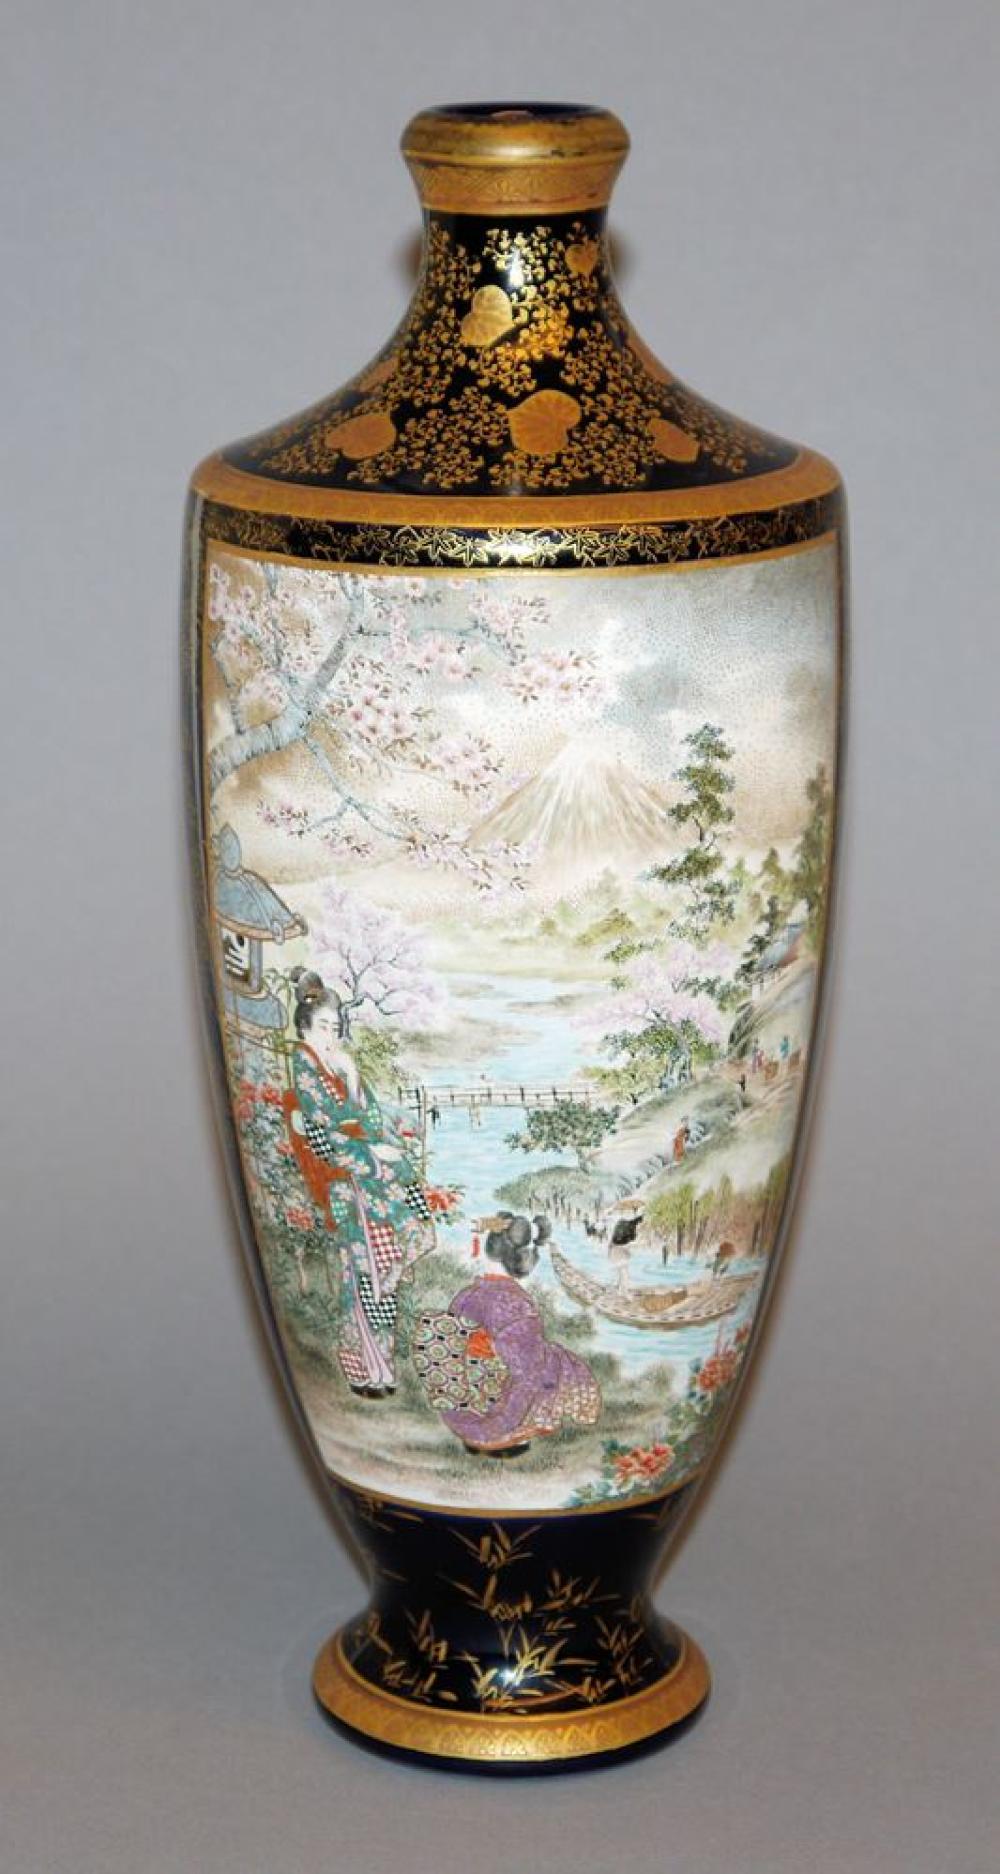 Exquisite Satsuma Vase der Kozan Studios, Meiji-Zeit, Japan, Ende 19. Jh.